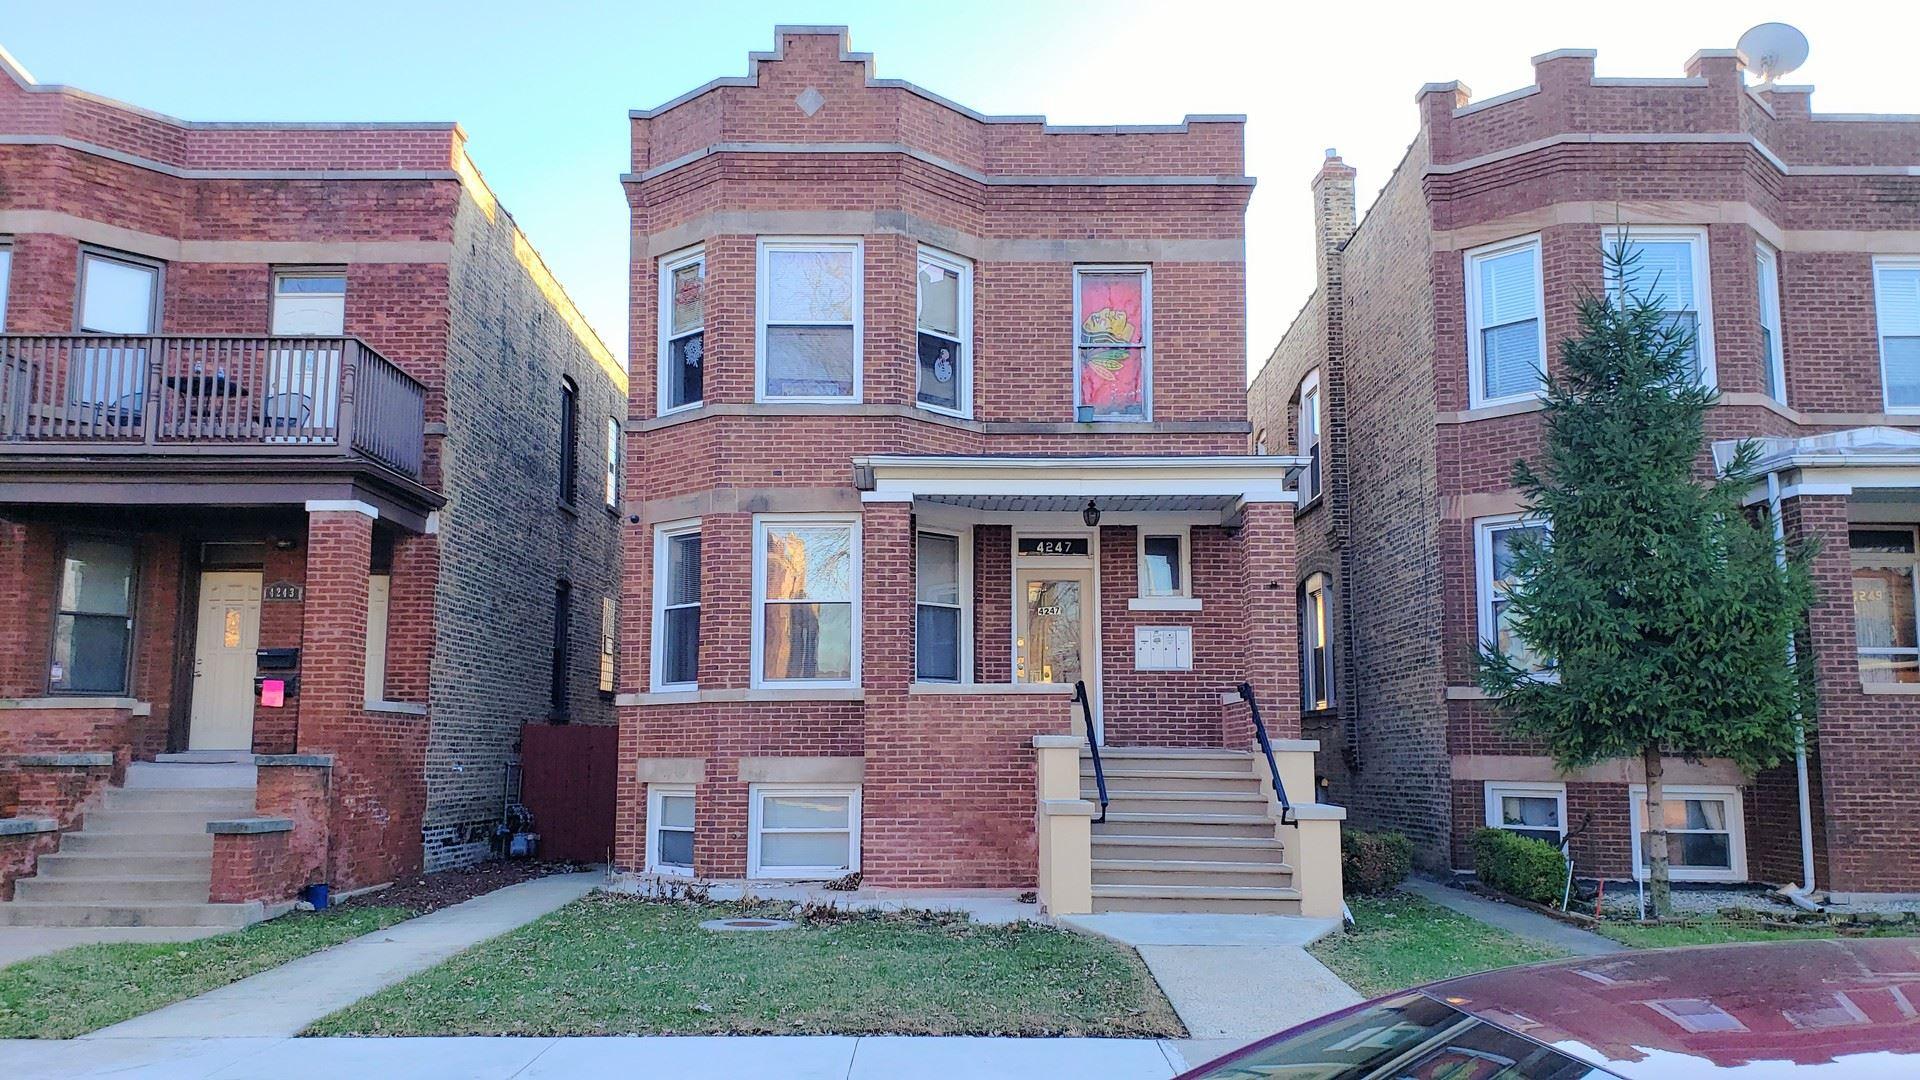 4247 W Melrose Street, Chicago, IL 60641 - #: 10745043